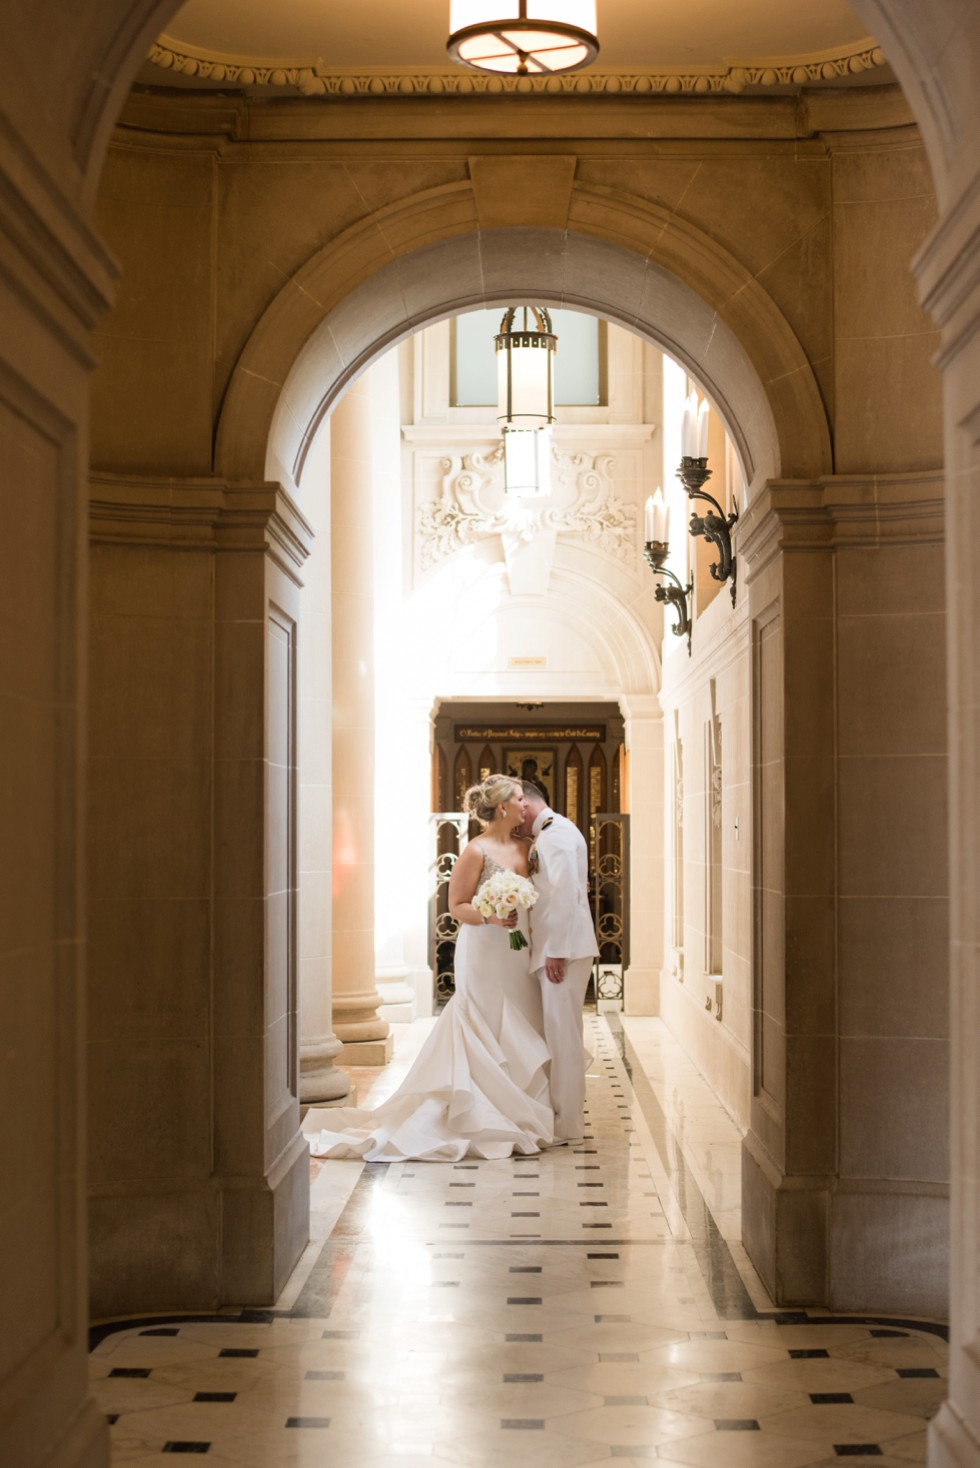 USNA Bancroft Hall romantic wedding photos